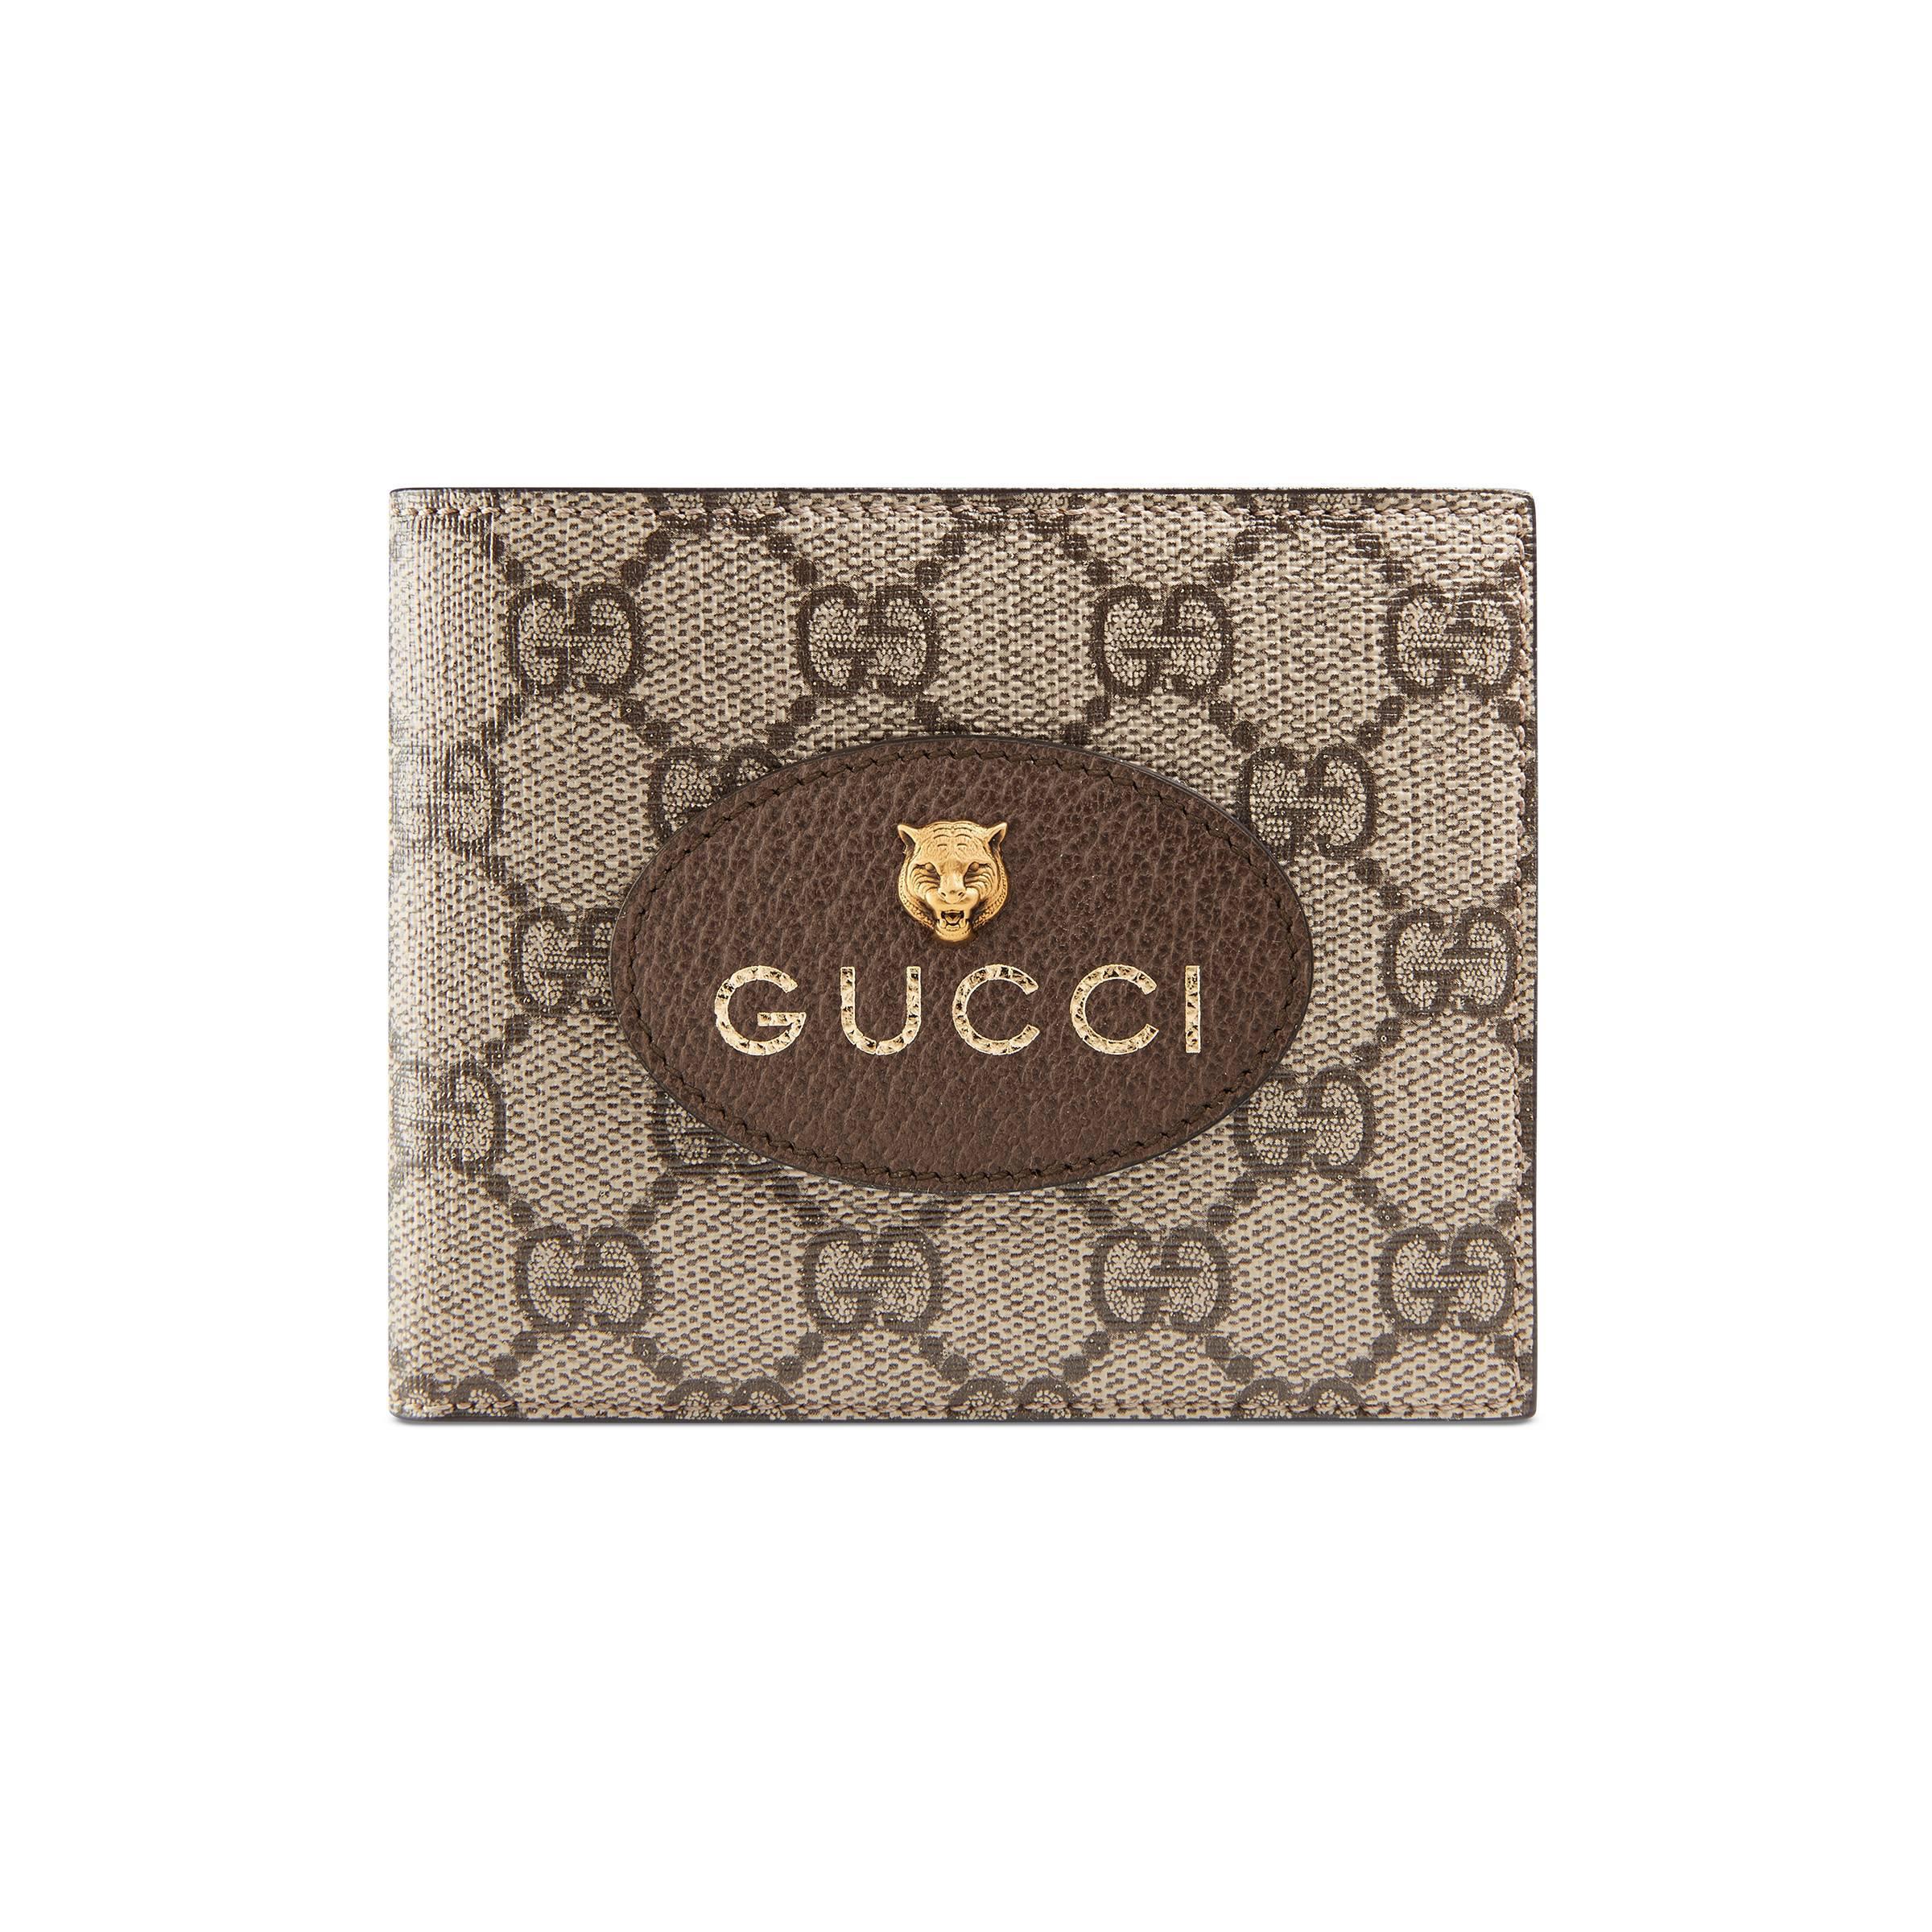 83edacaef27 Gucci - Natural GG Supreme Wallet for Men - Lyst. View fullscreen